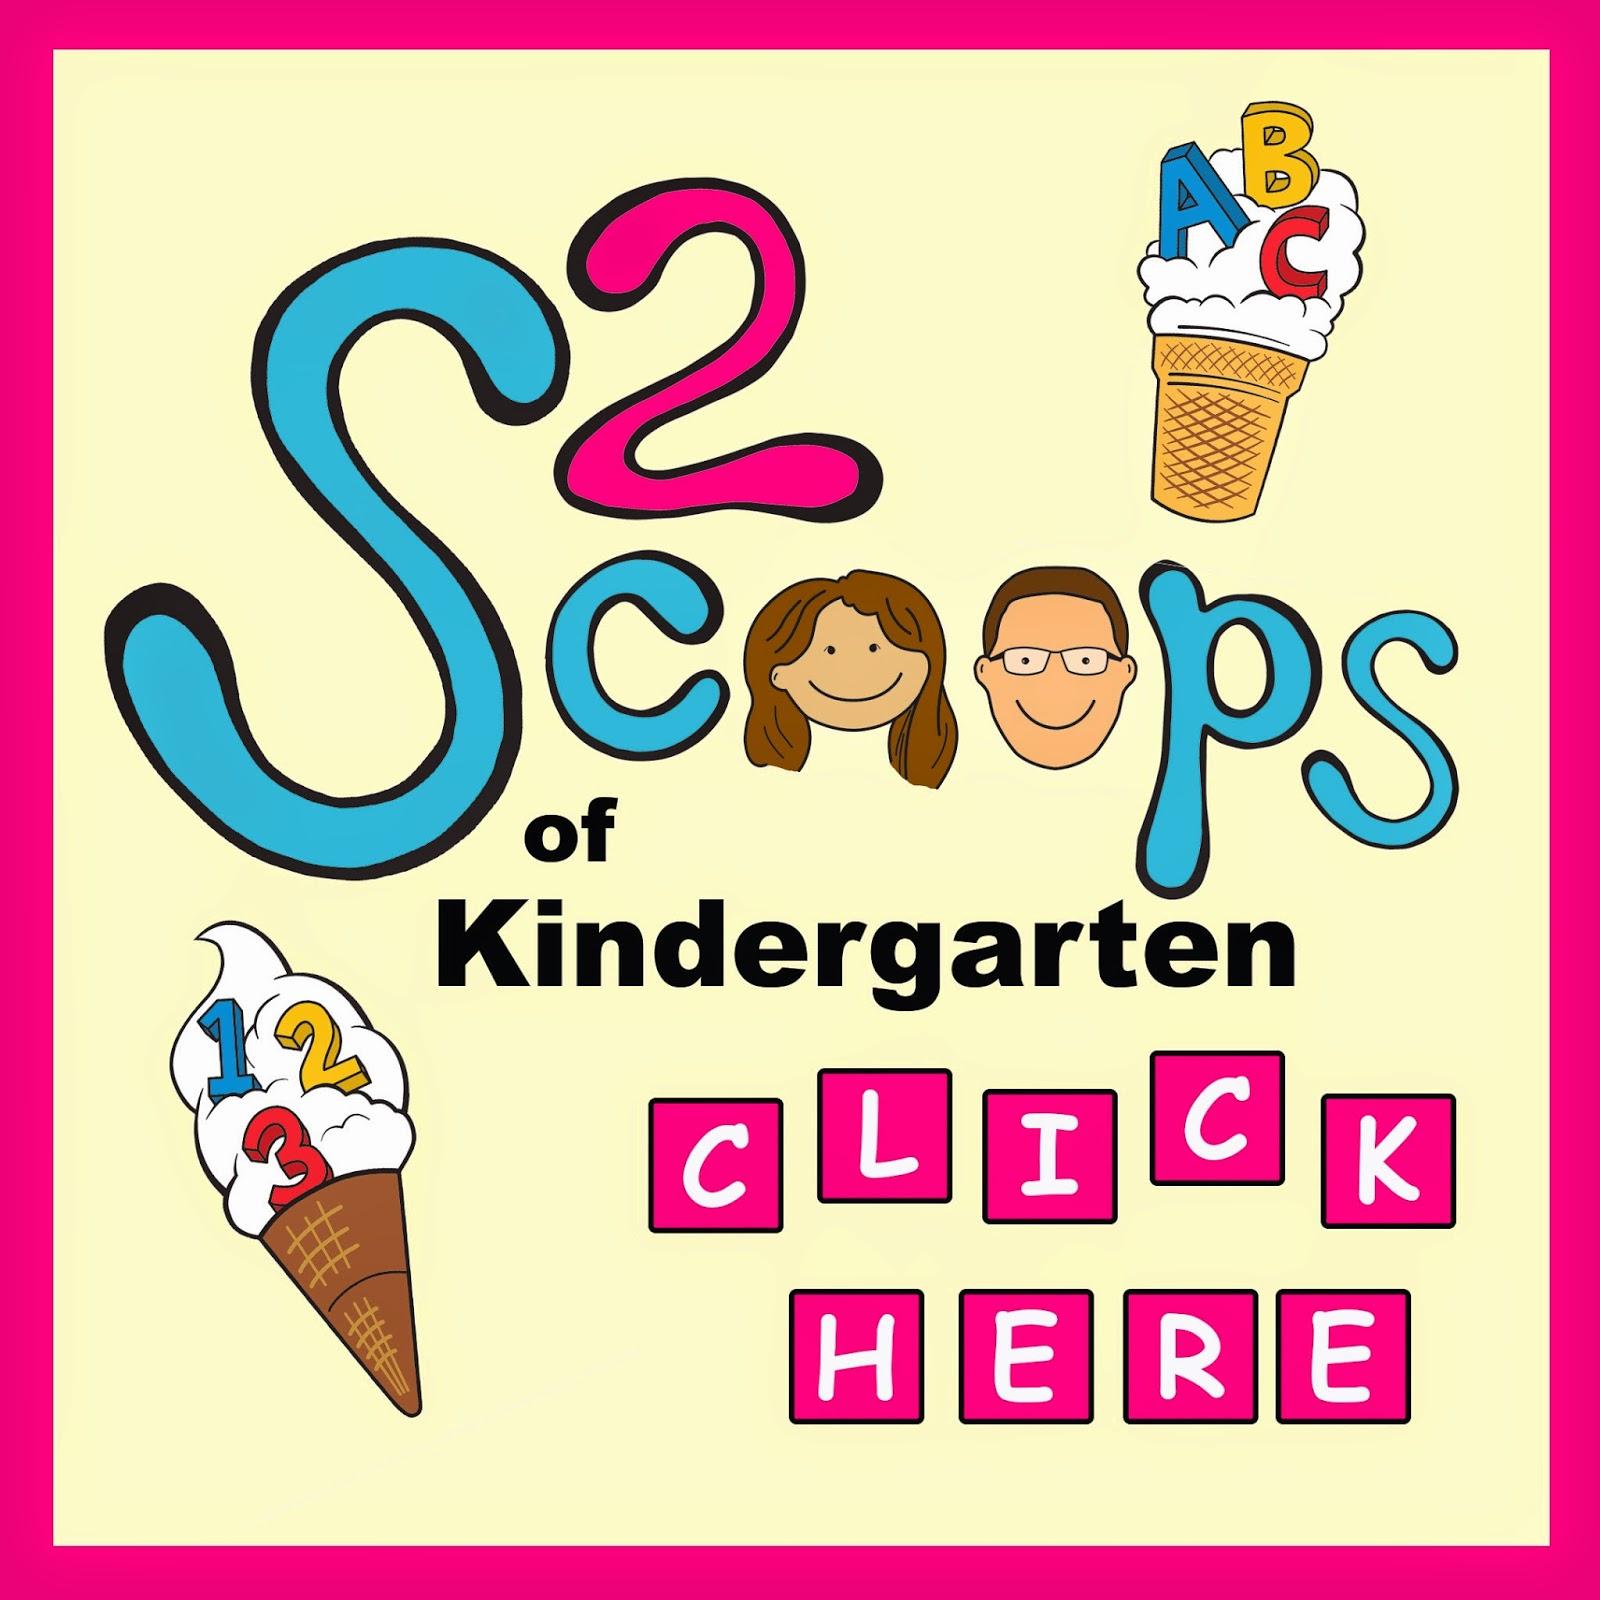 http://www.teacherspayteachers.com/Store/2-Scoops-Of-Kindergarten